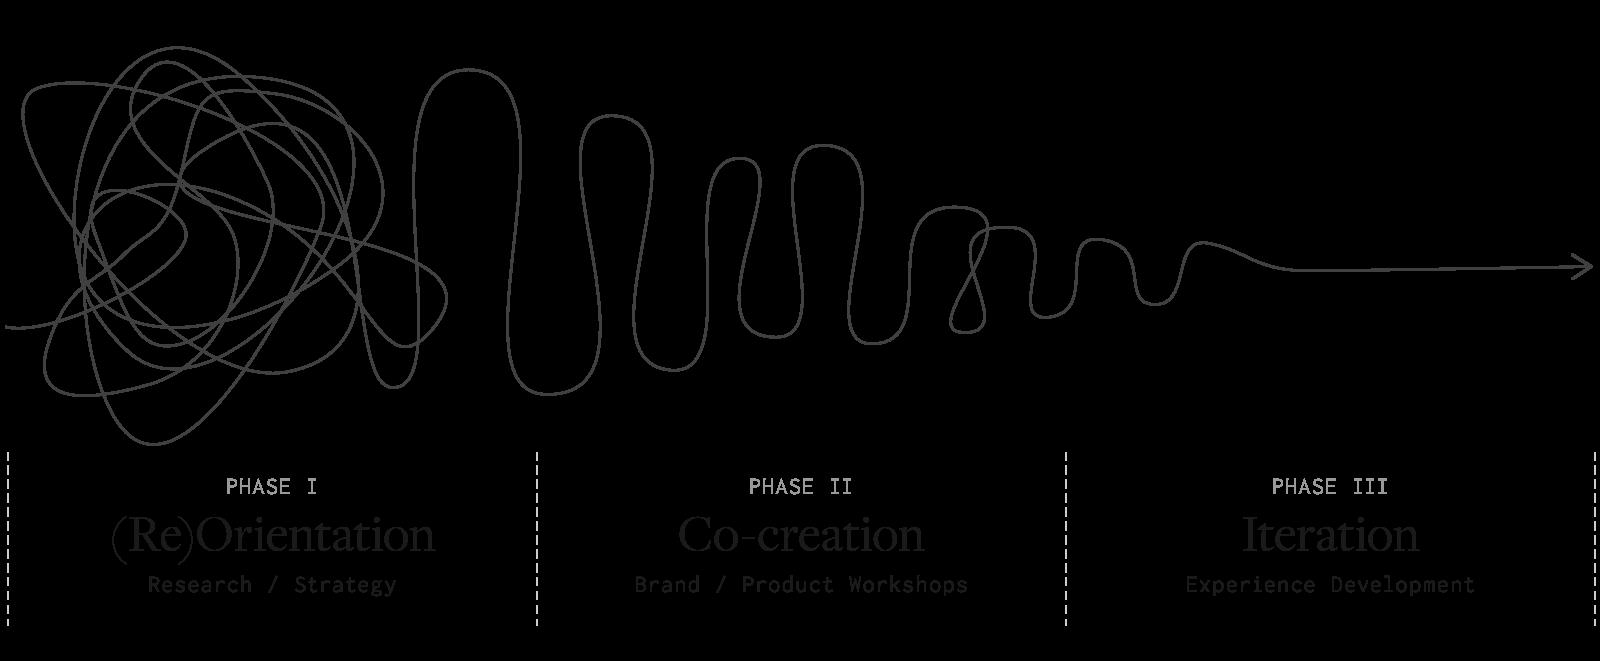 gs-process-diagram.png